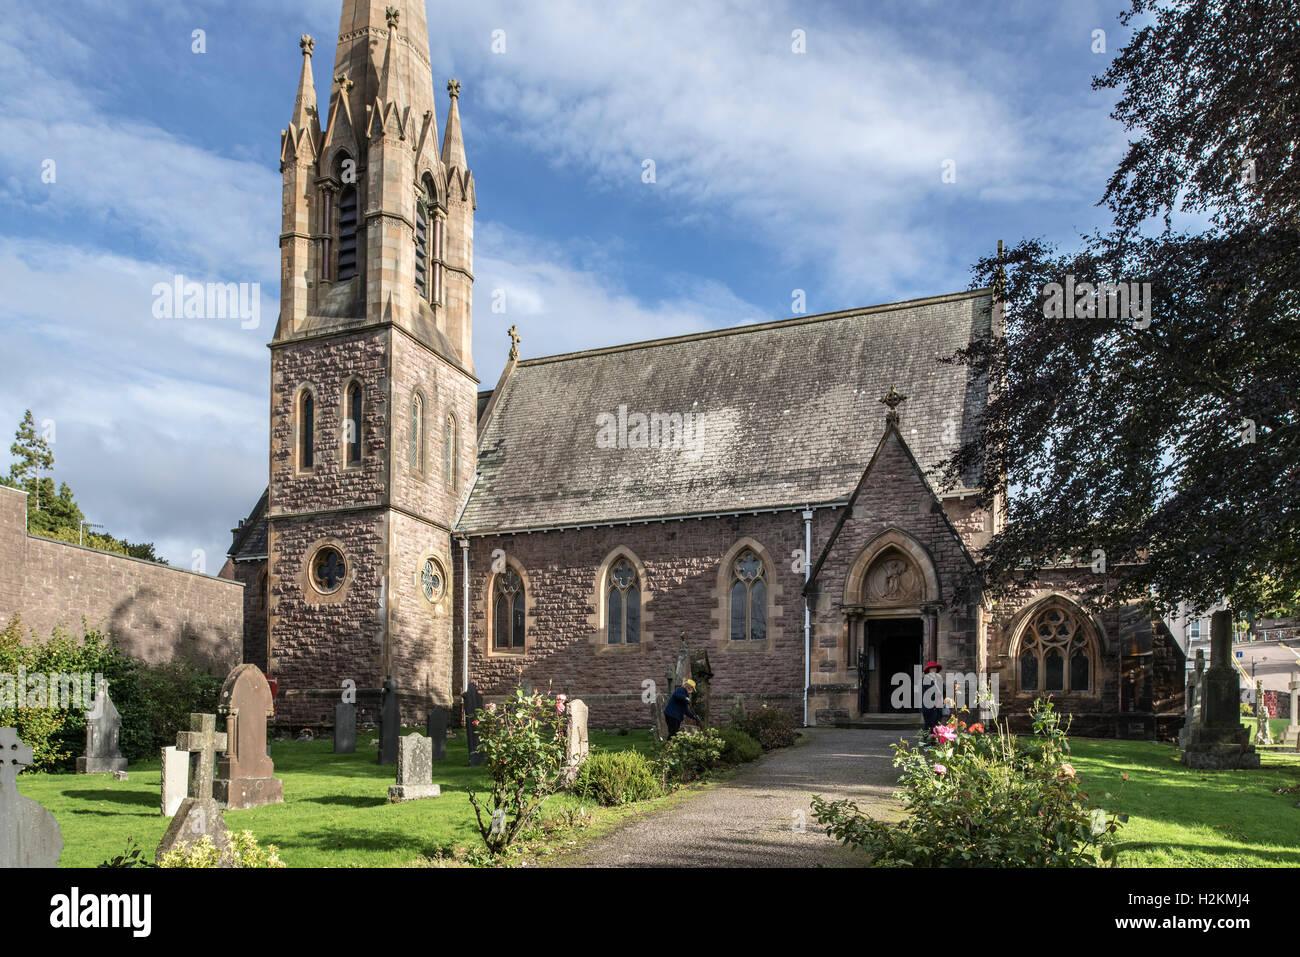 Saint Andrew's Church at Fort William, Scottish Highlands, Scotland, UK Stock Photo